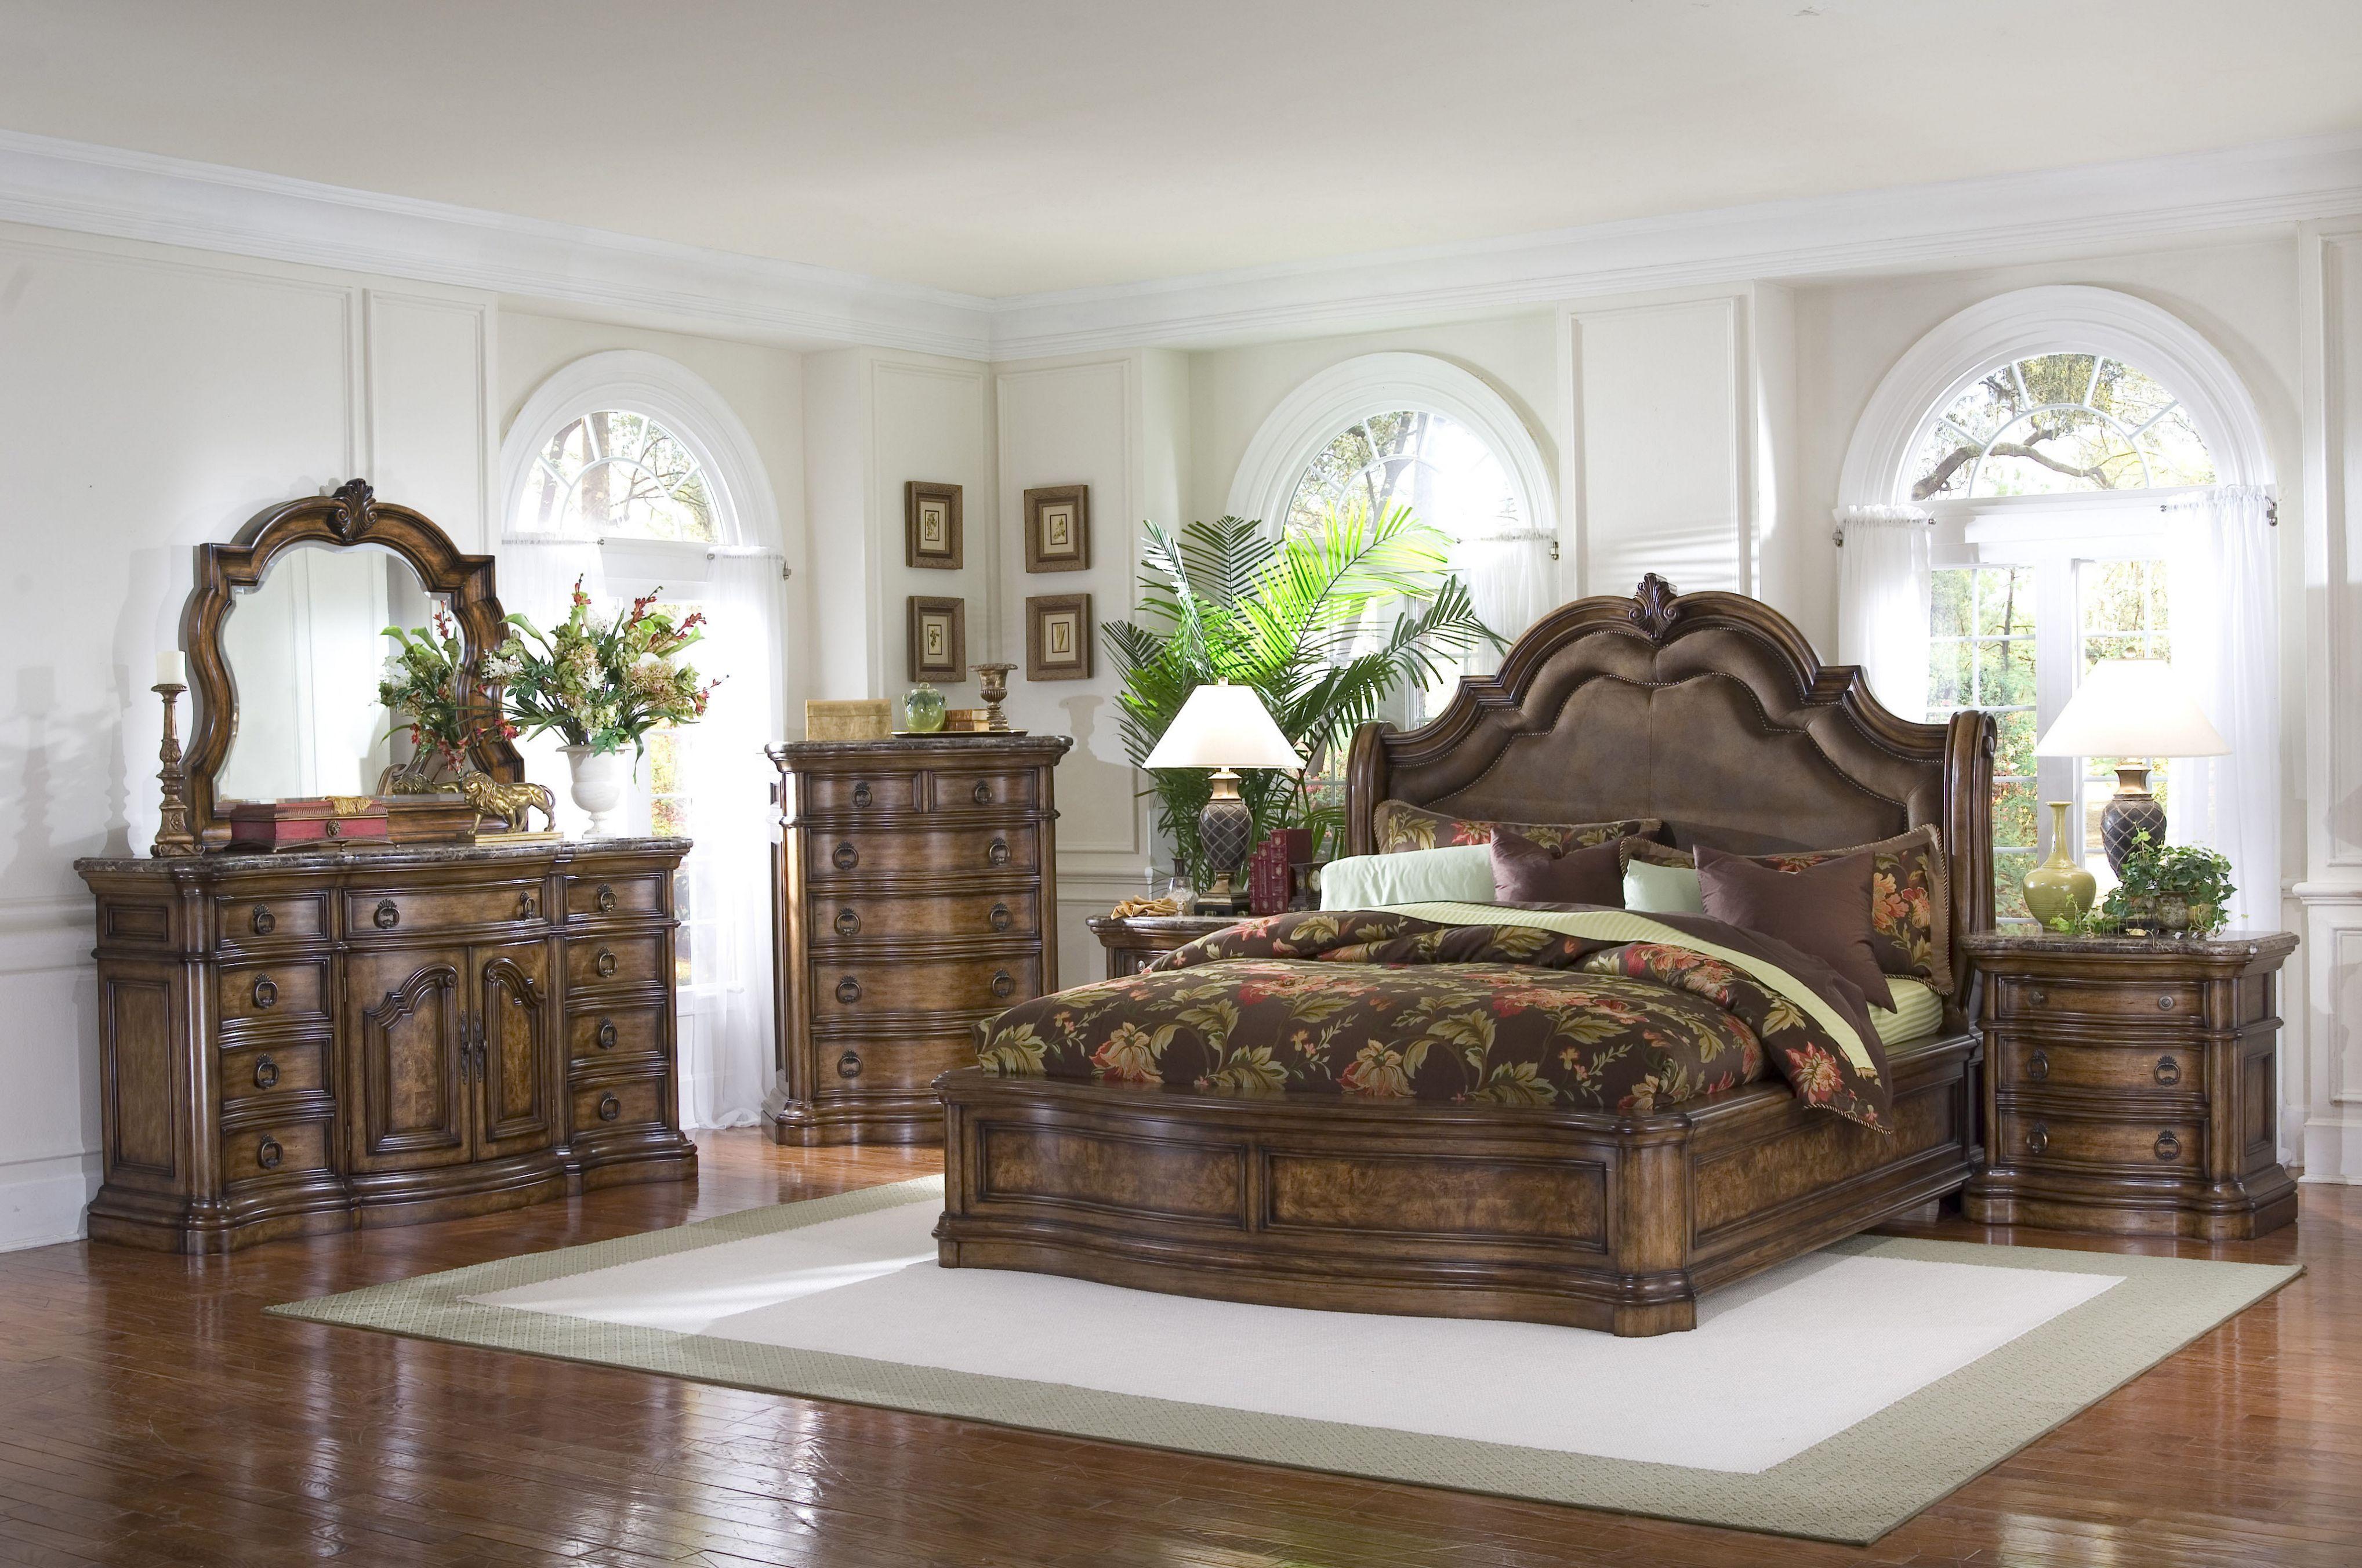 El Dorado Furniture Beds - Modern Furniture Cheap Check more at